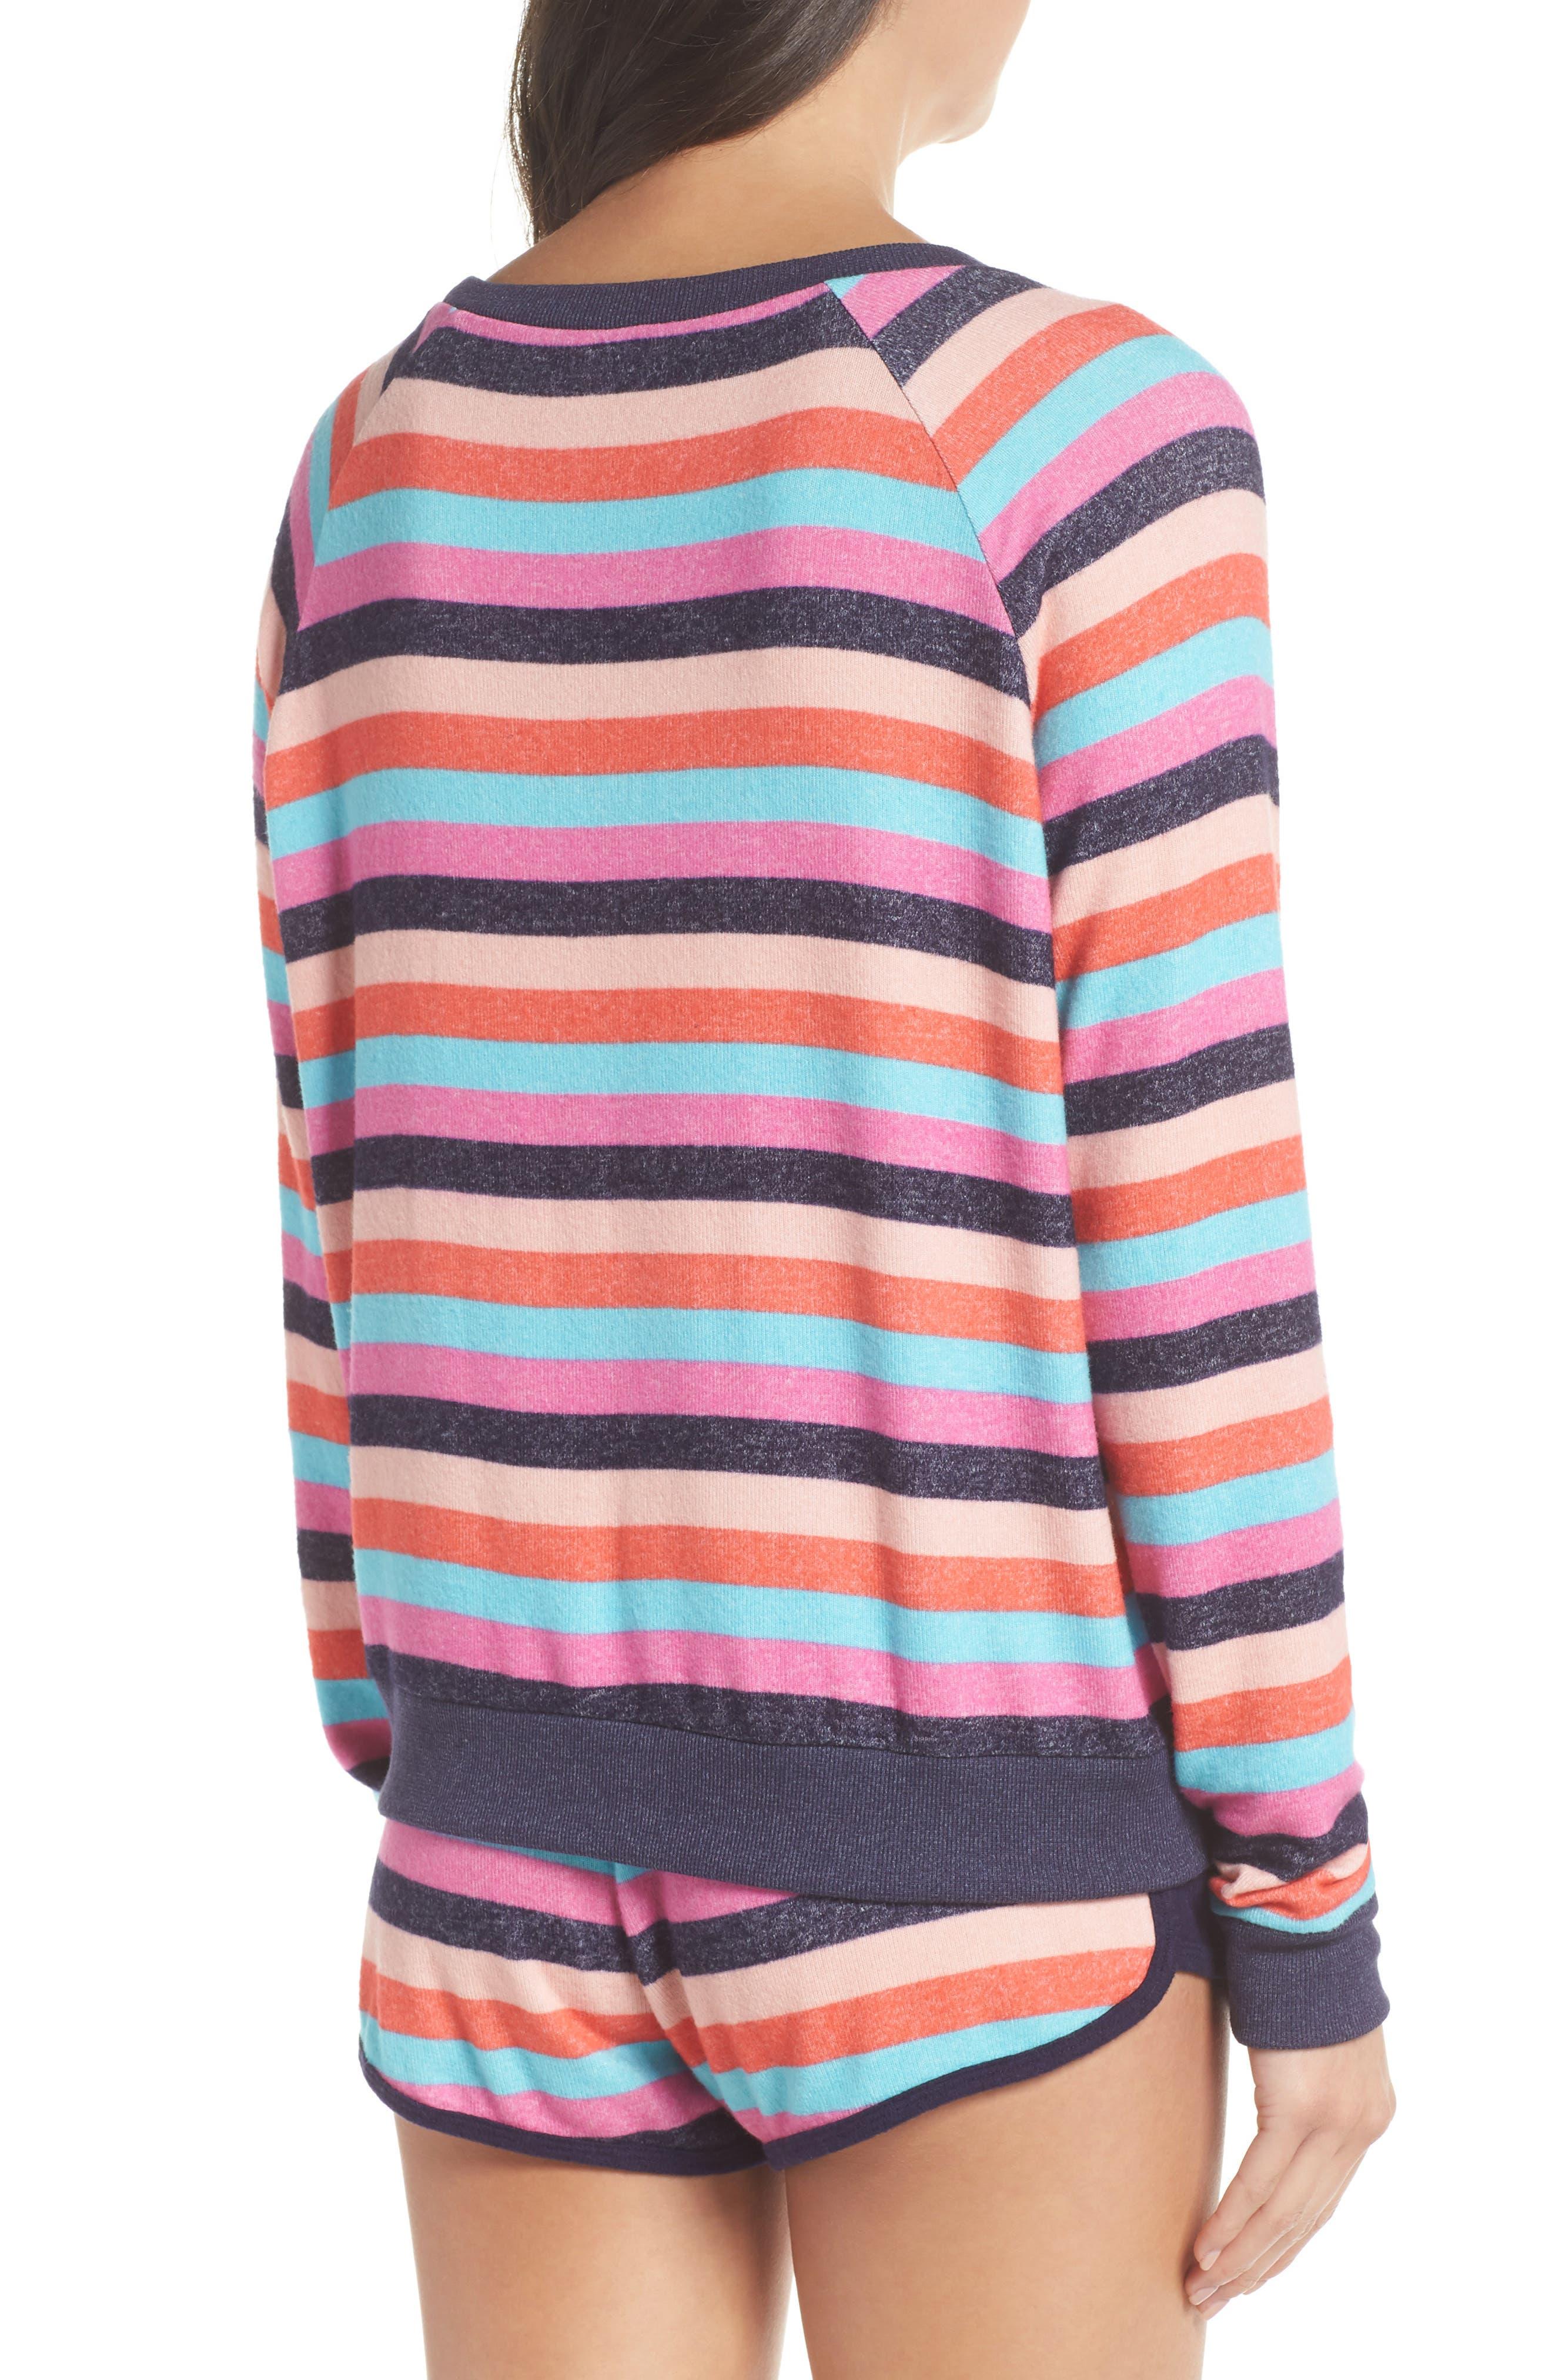 Cozy Crew Raglan Sweatshirt,                             Alternate thumbnail 2, color,                             Navy Dusk Milli Multi Stripe